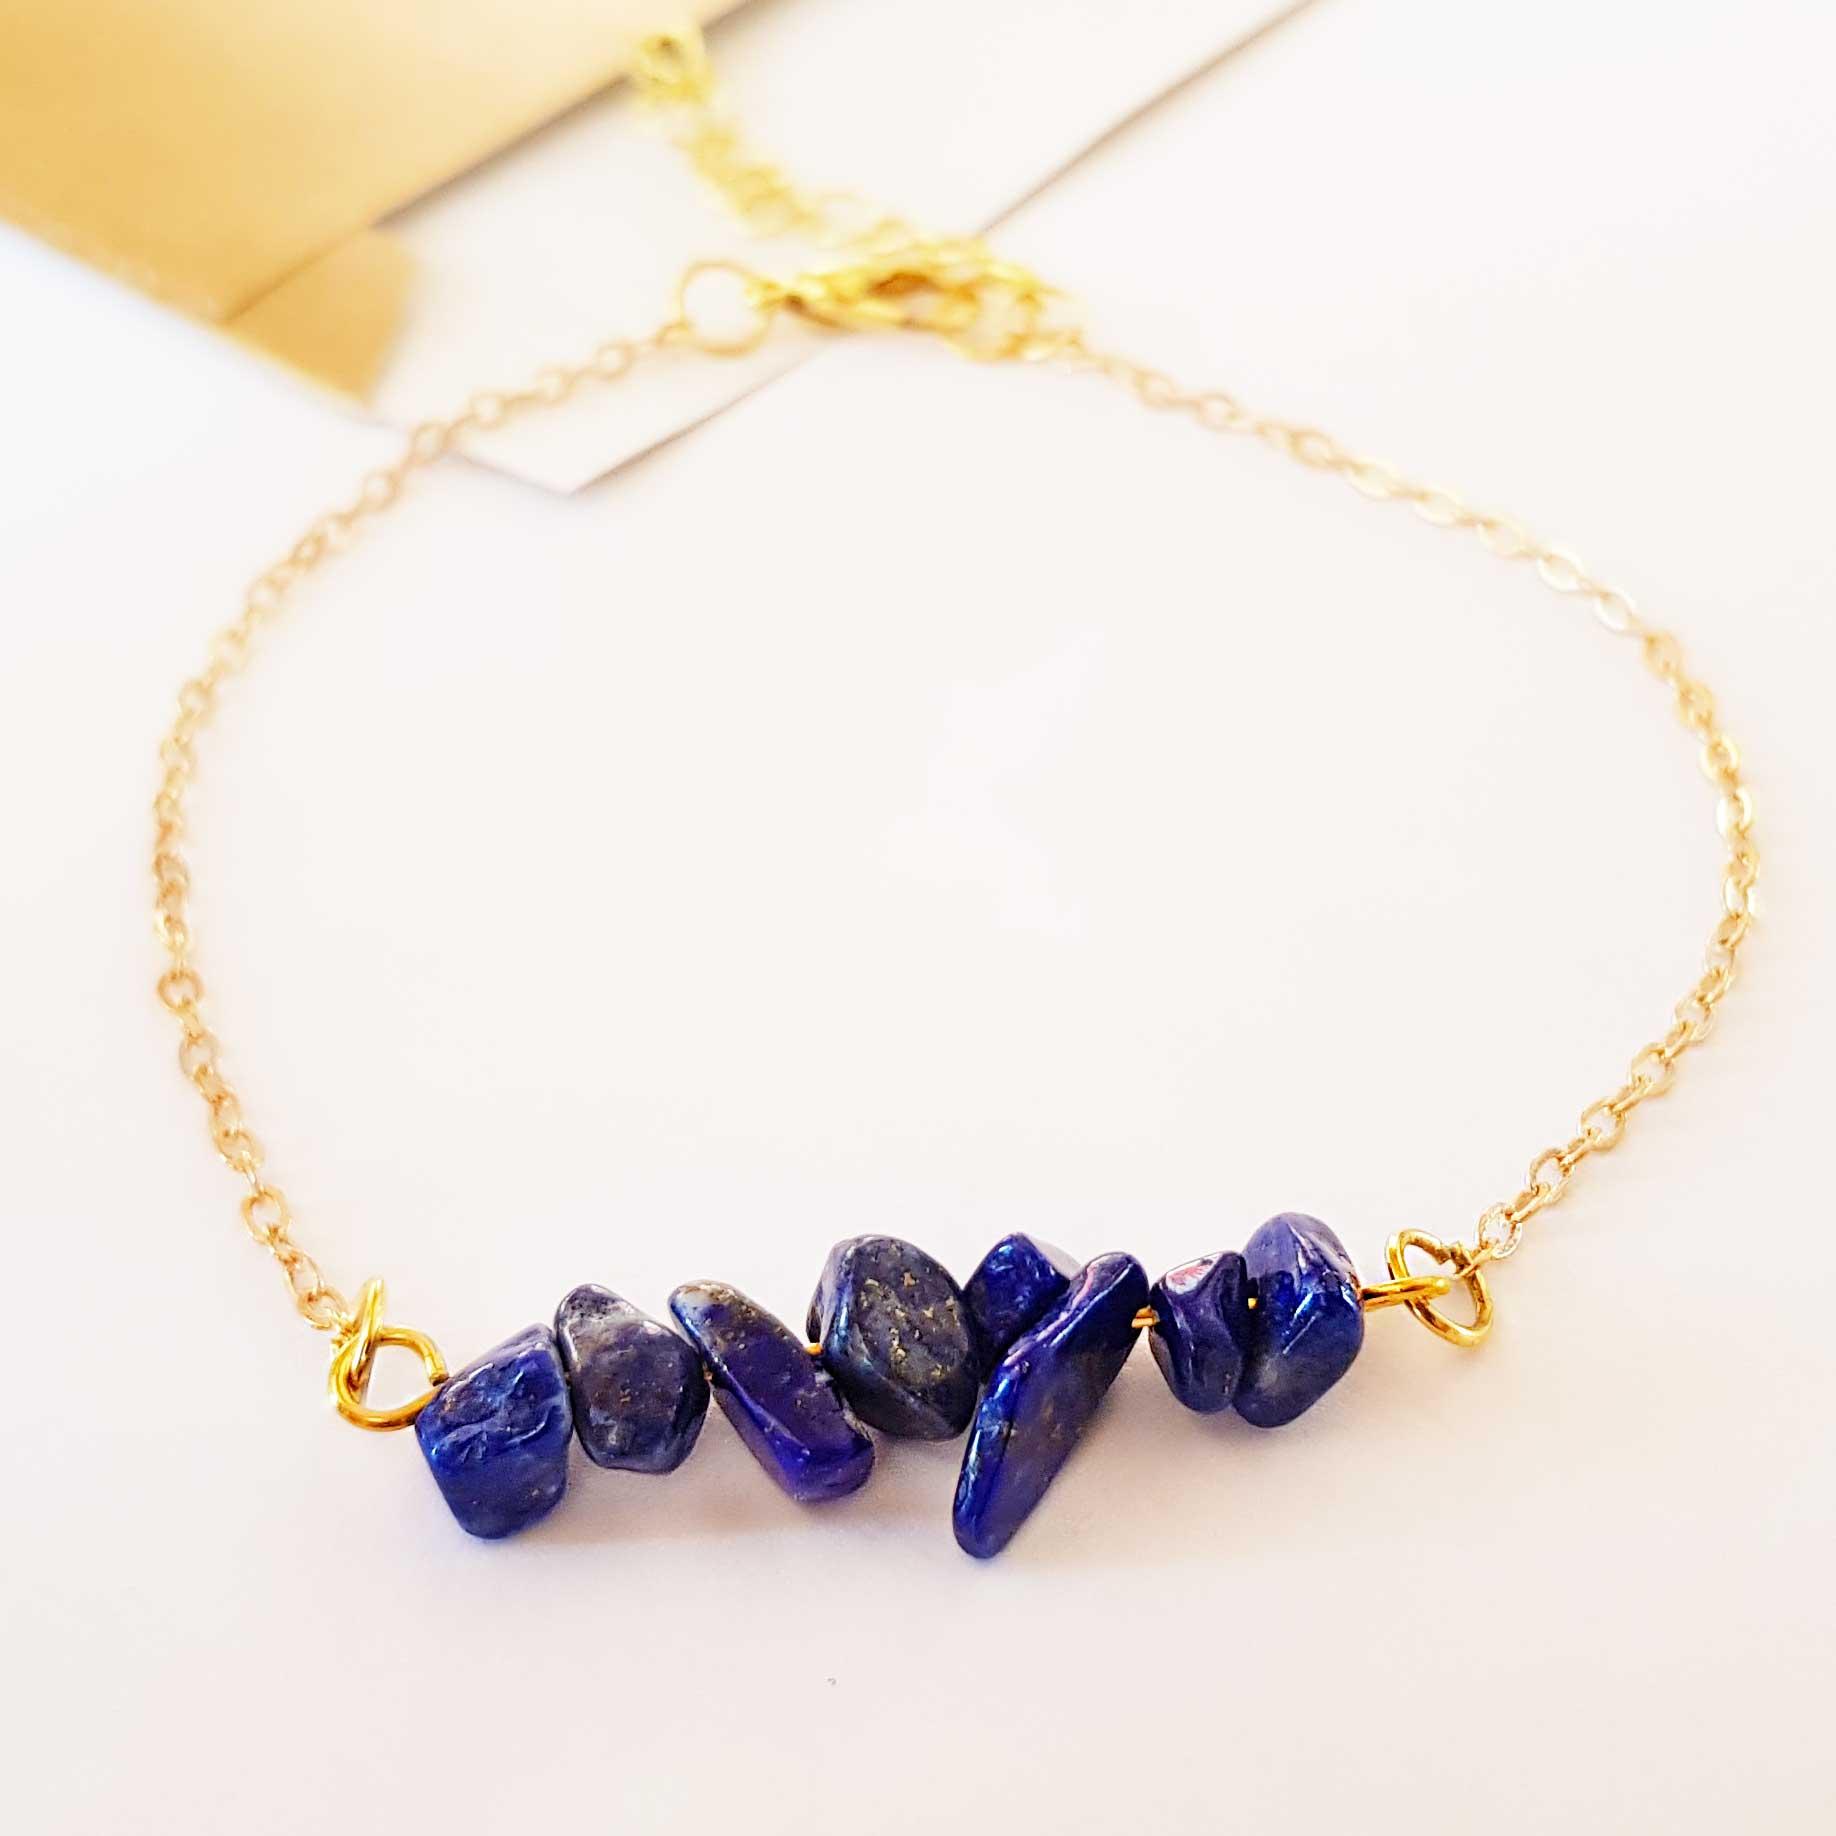 Lapis Naturstein Armband blau gold Gliederkette